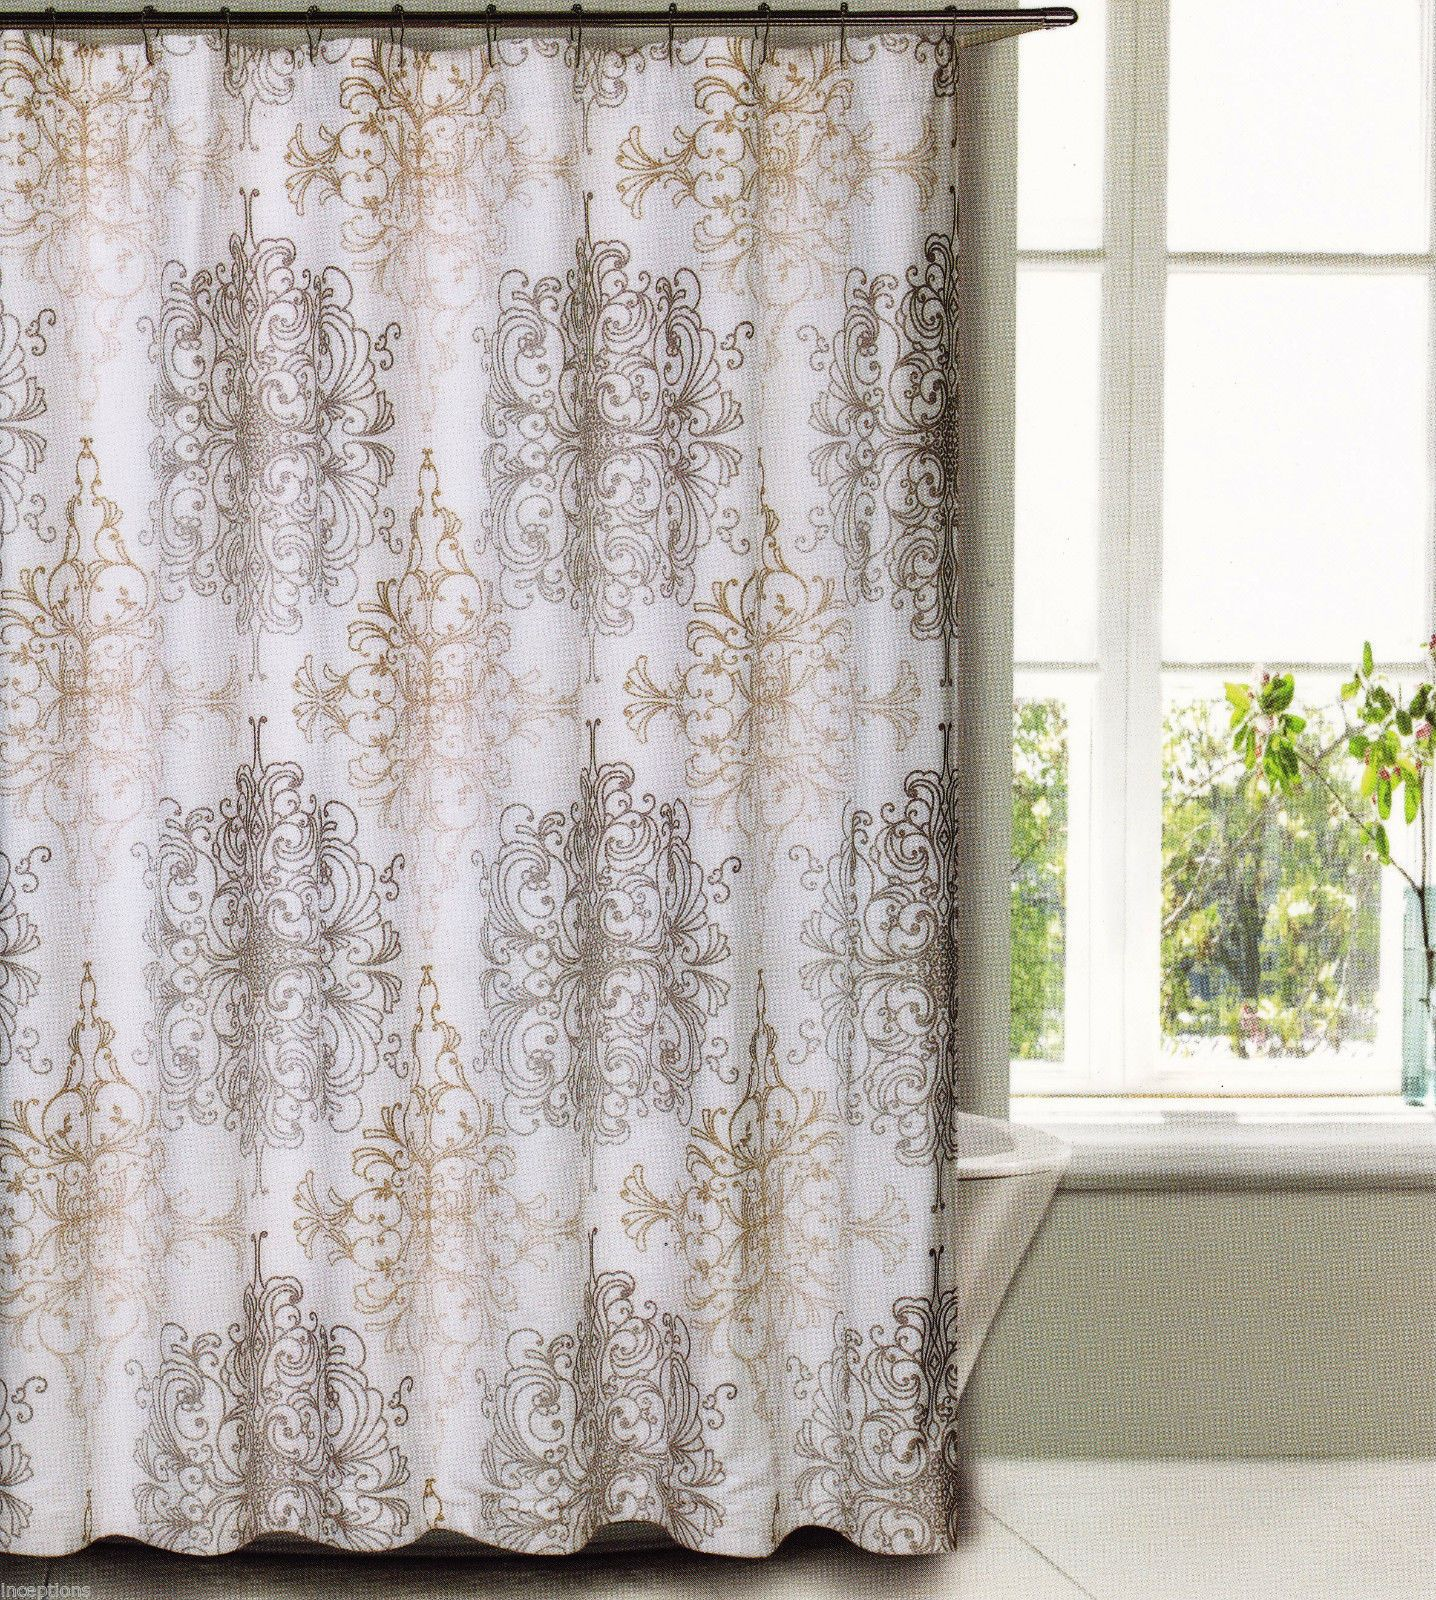 Tahari Fabric Cotton Blend Shower Curtain Milan Scroll Taupe Khaki